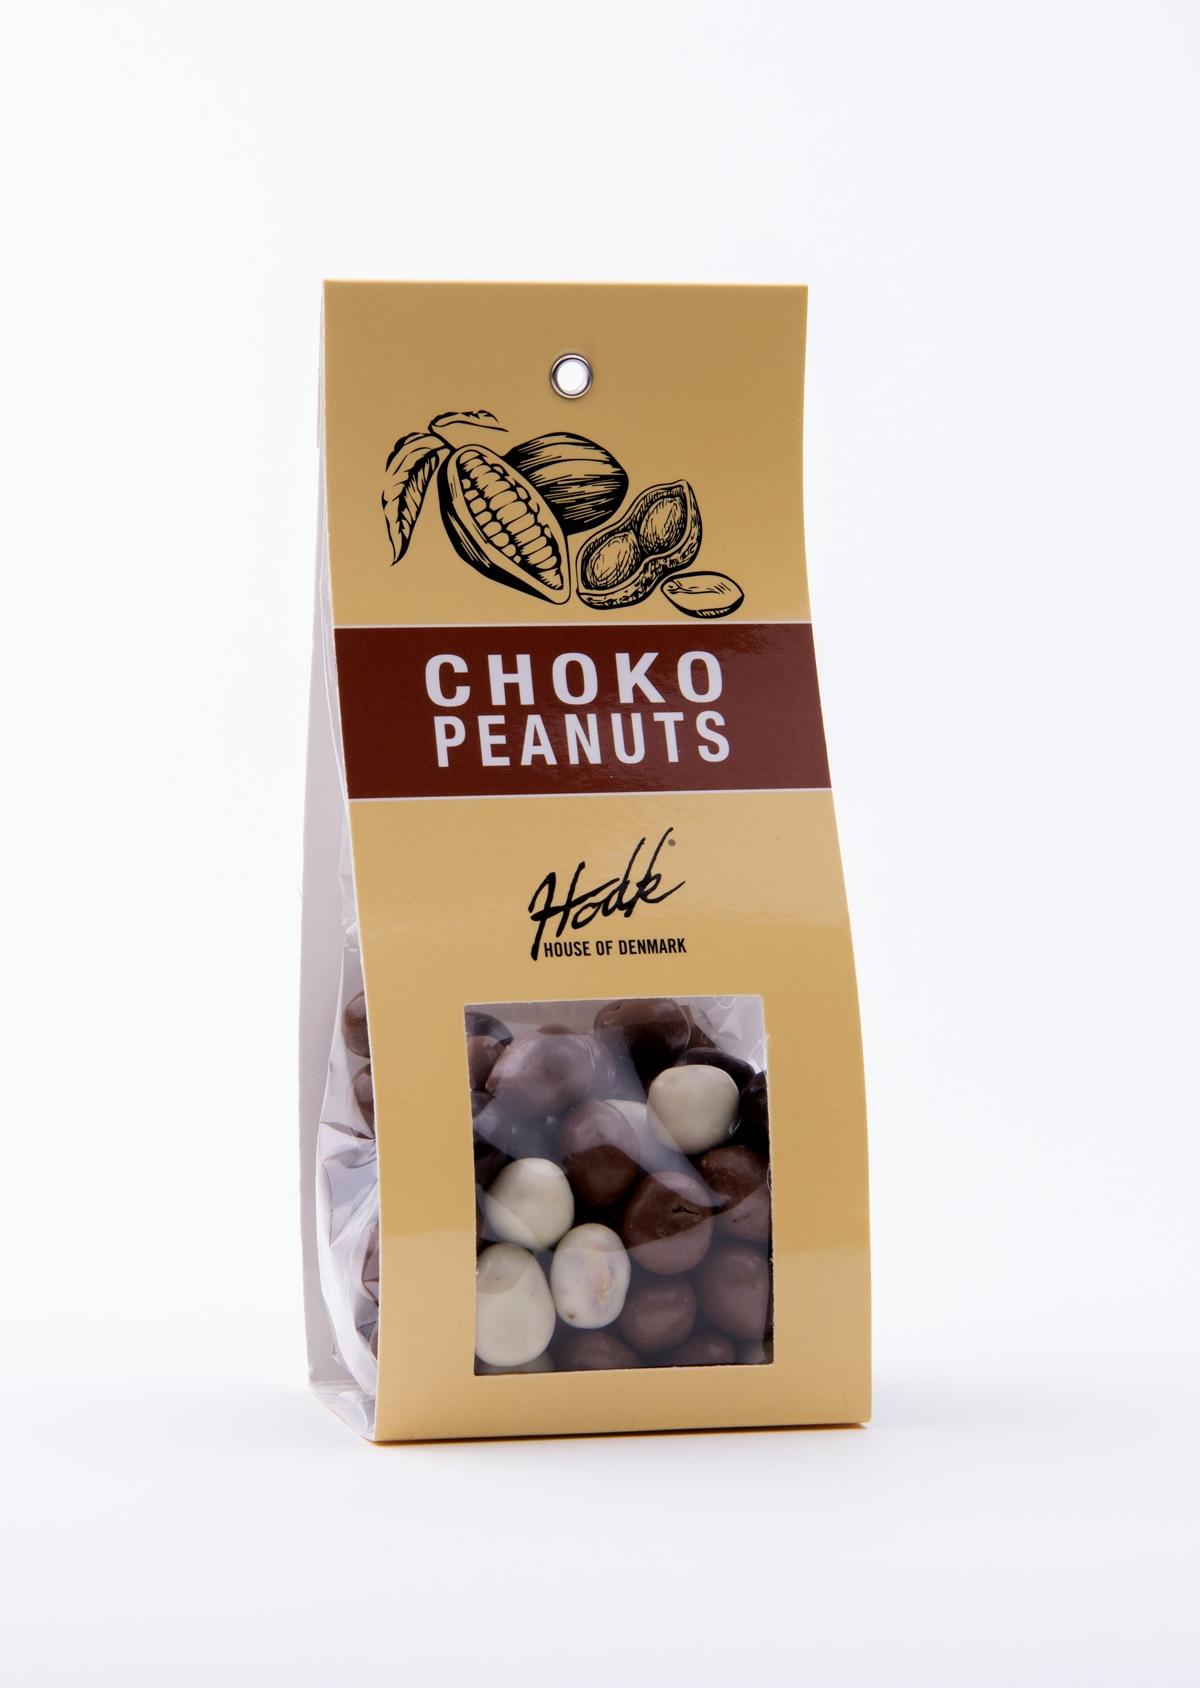 Choko Peanuts